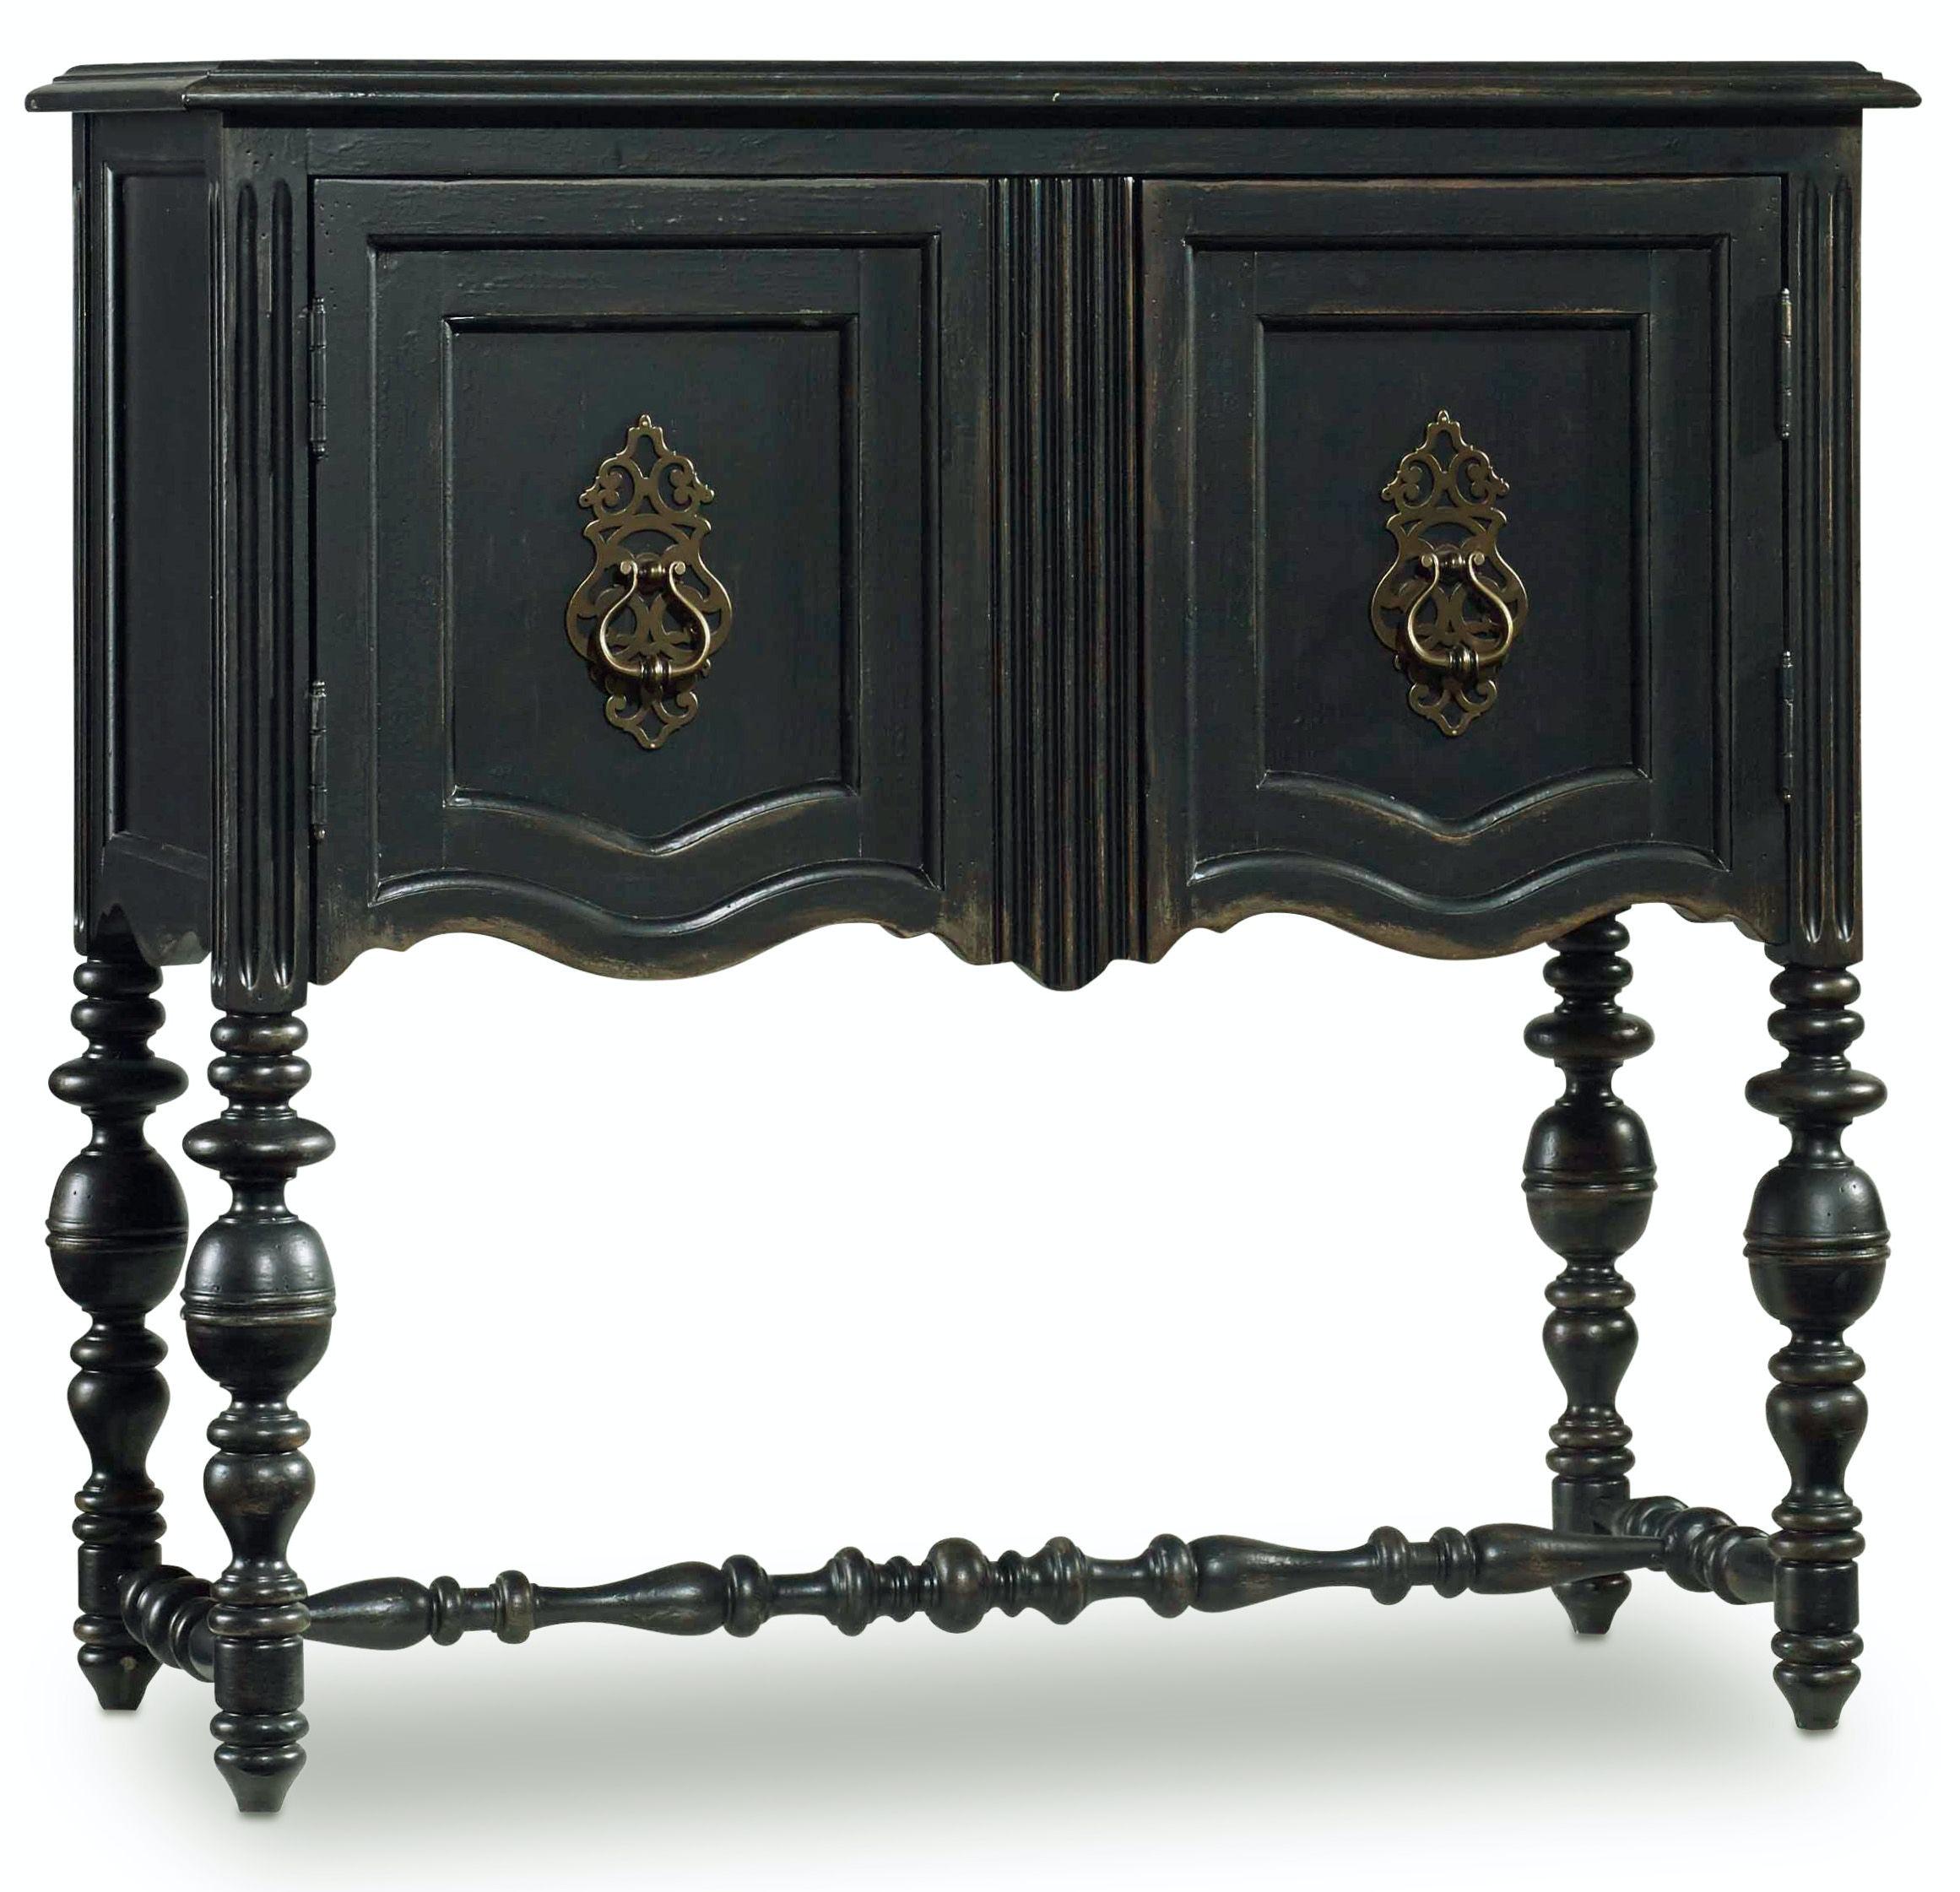 Hooker Furniture Chest 500 50 904